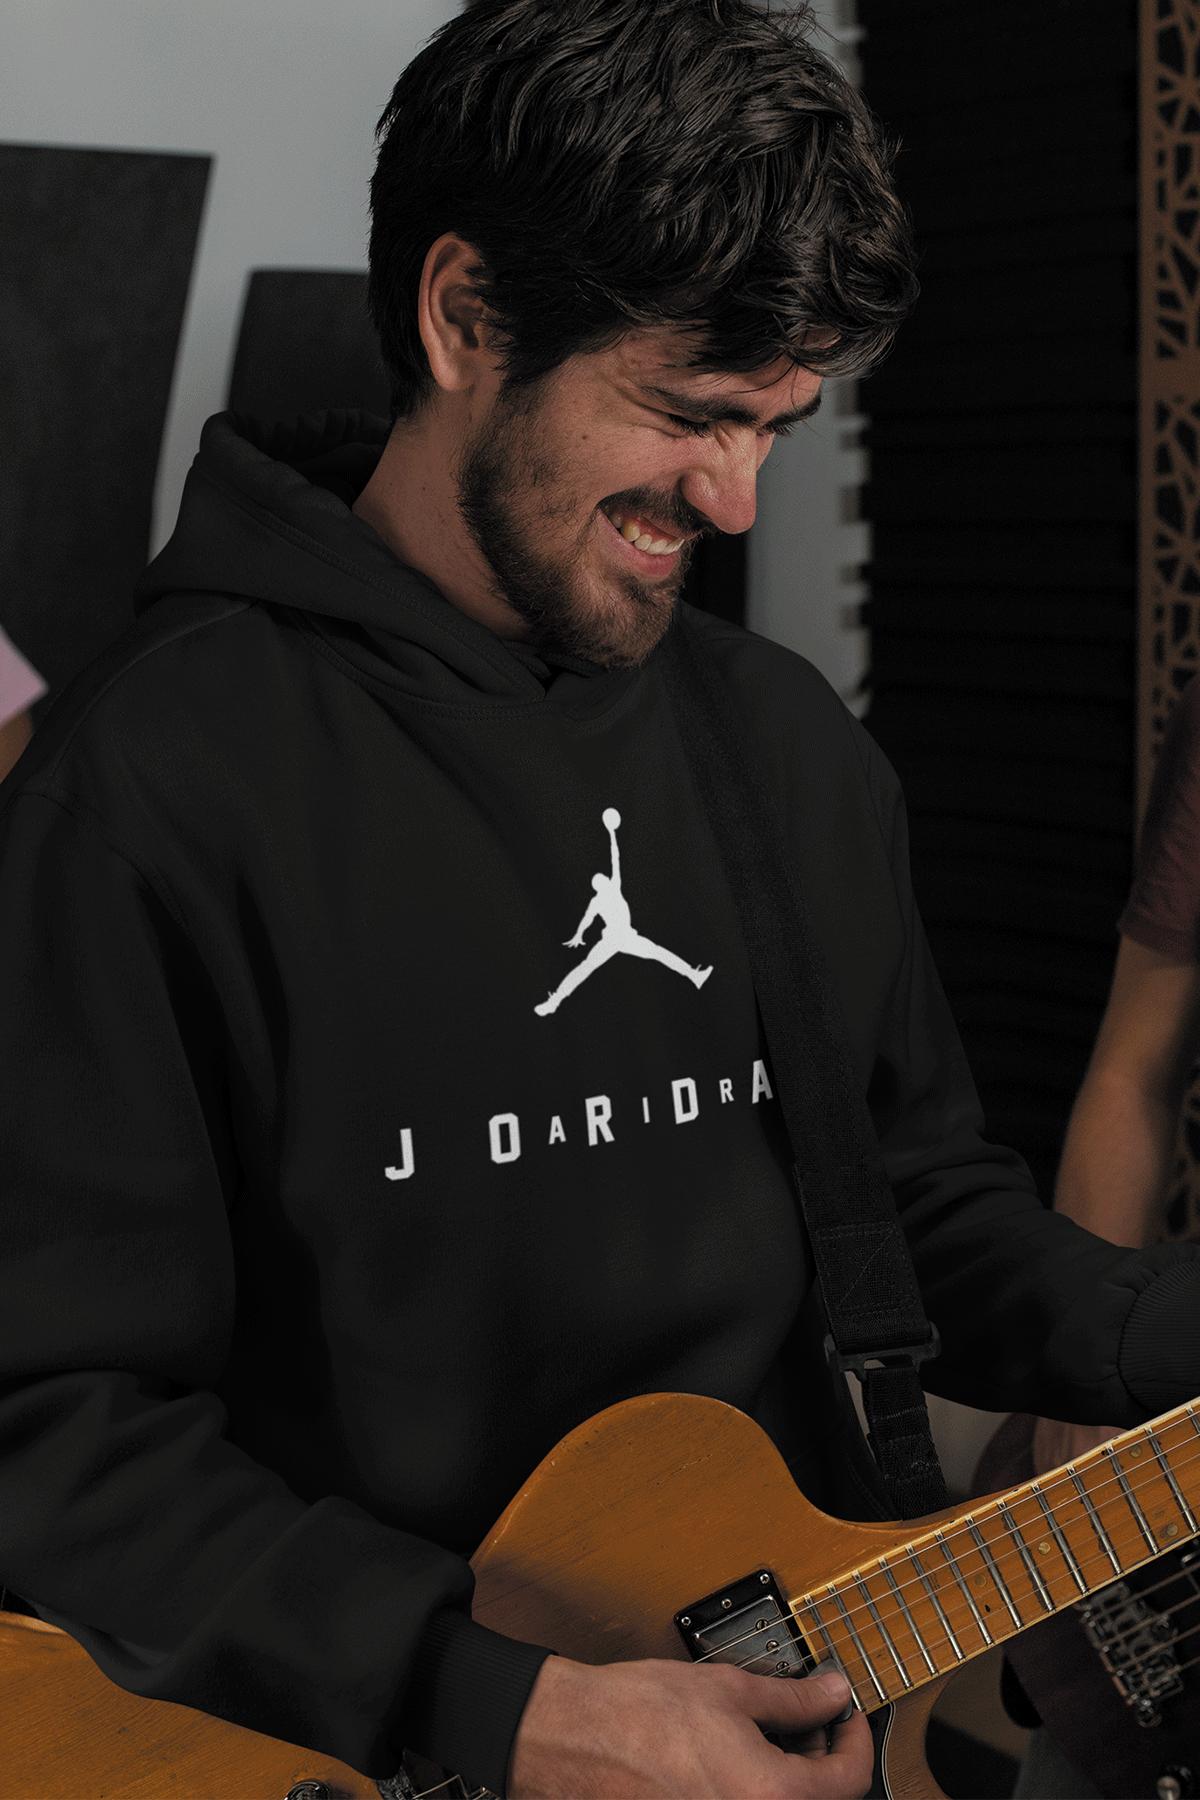 Air Jordan 10 Siyah NBA Erkek Kapşonlu Sweatshirt - Hoodie